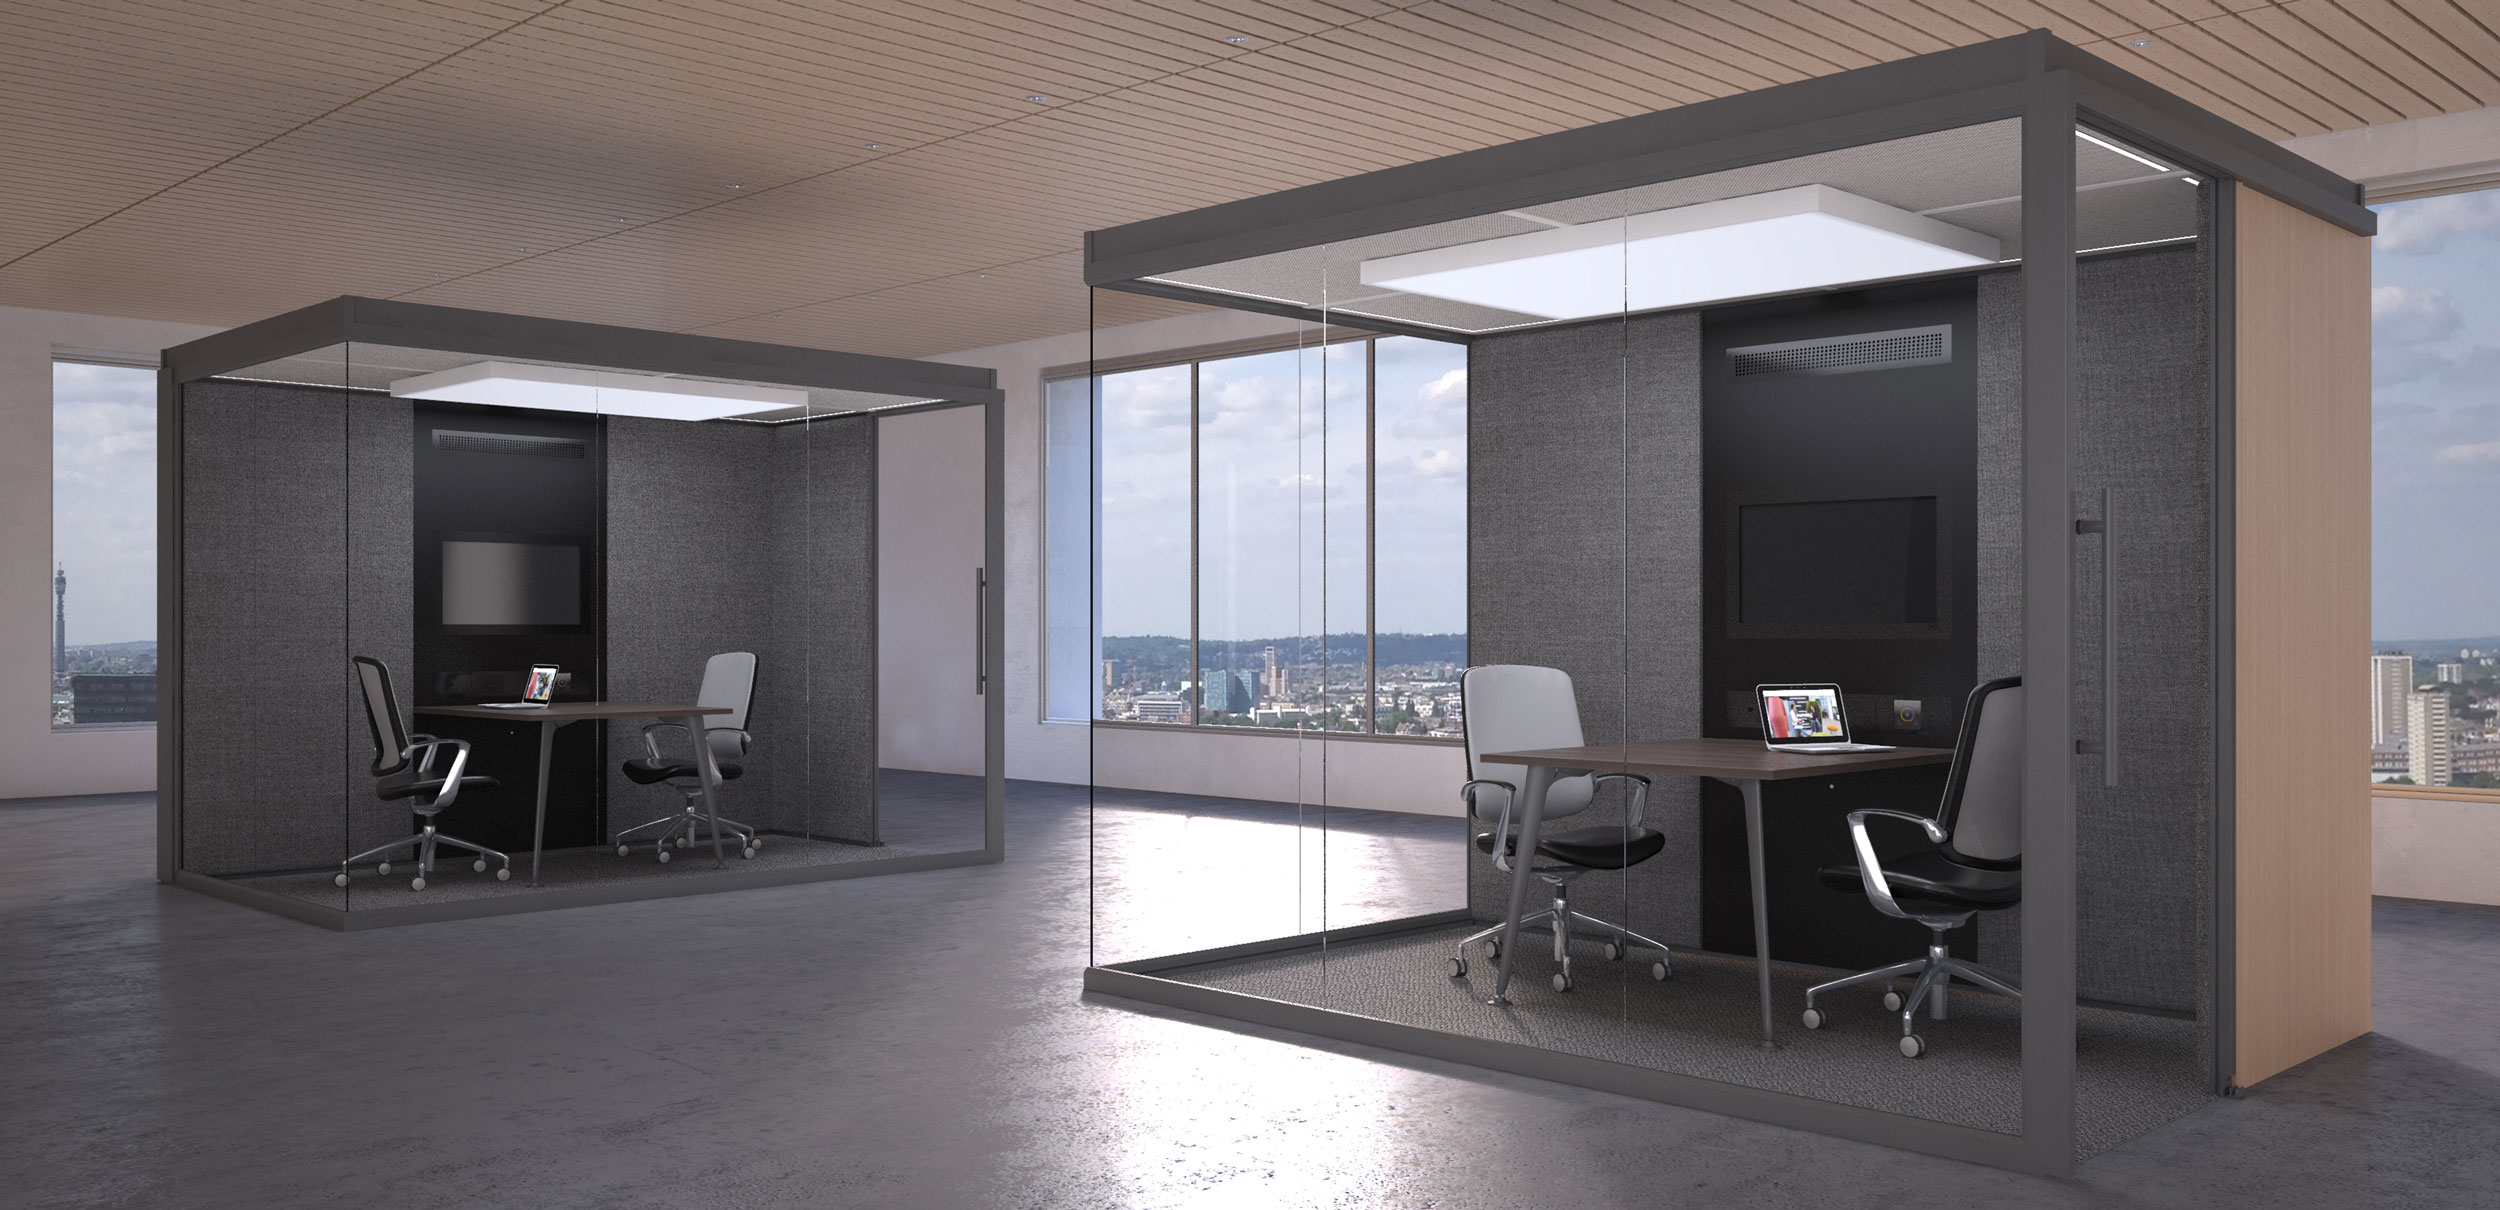 Boss Design Infinity 2 Pod In Situ